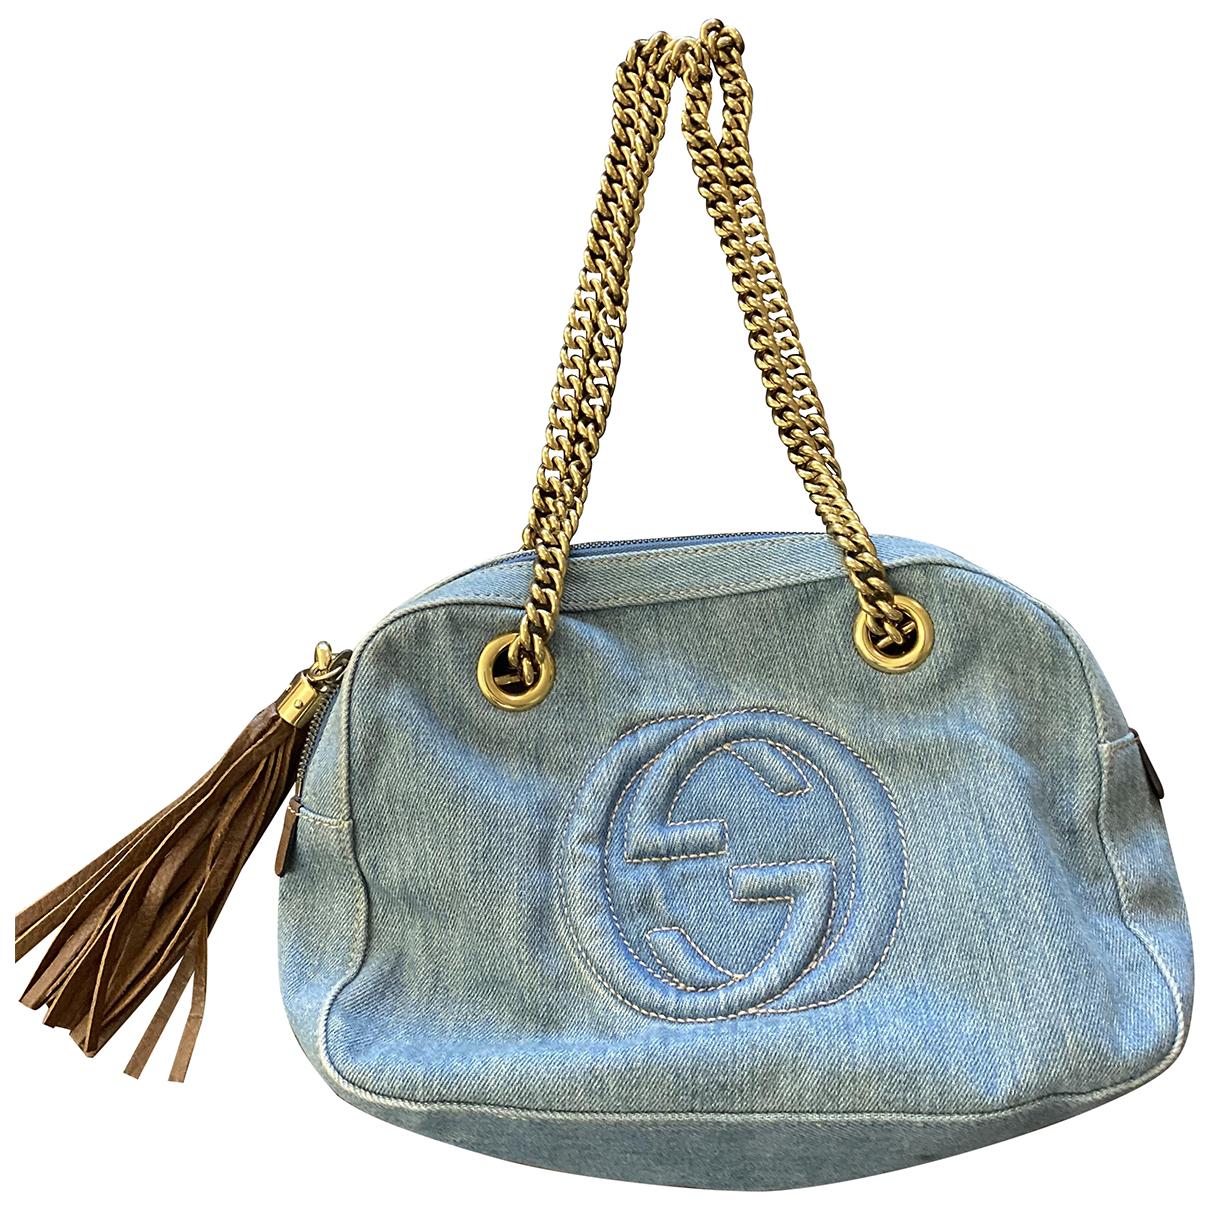 Gucci - Sac a main Soho pour femme en denim - bleu